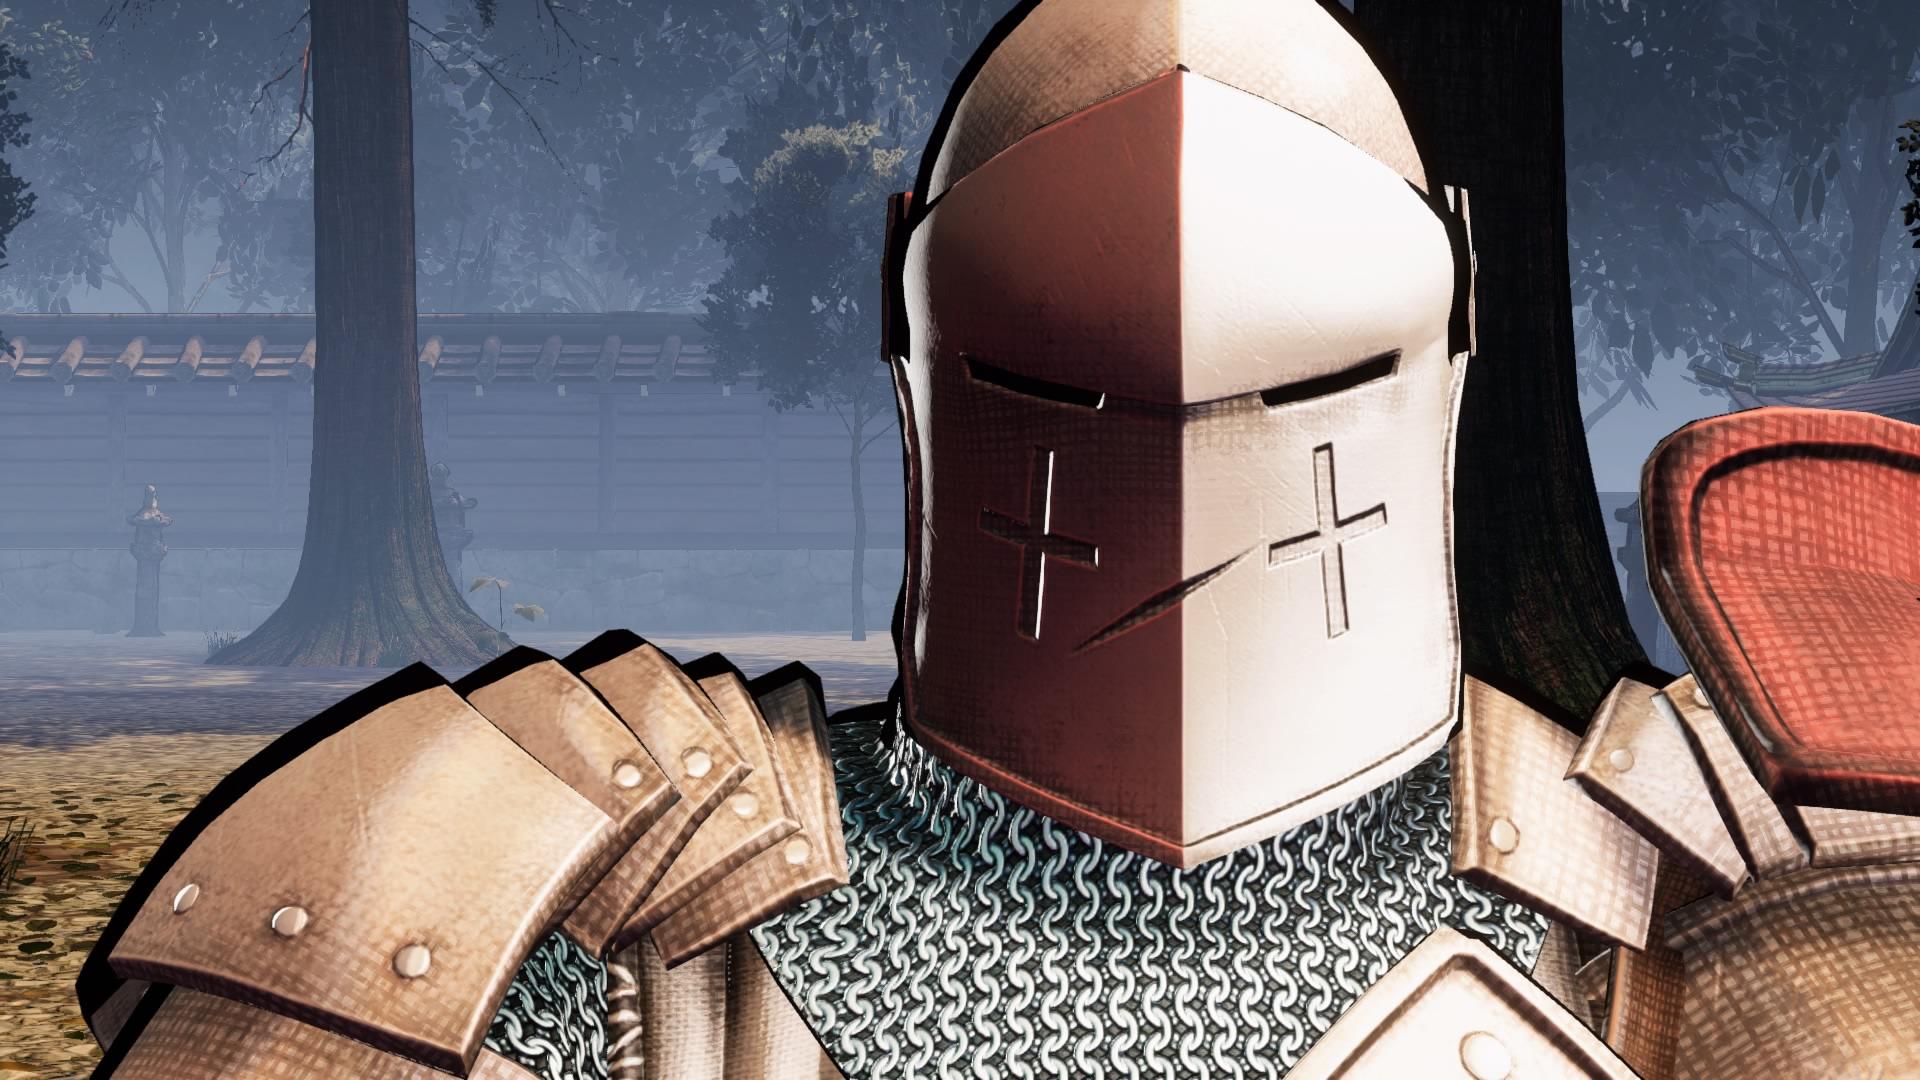 Samurai Shodown - Warden